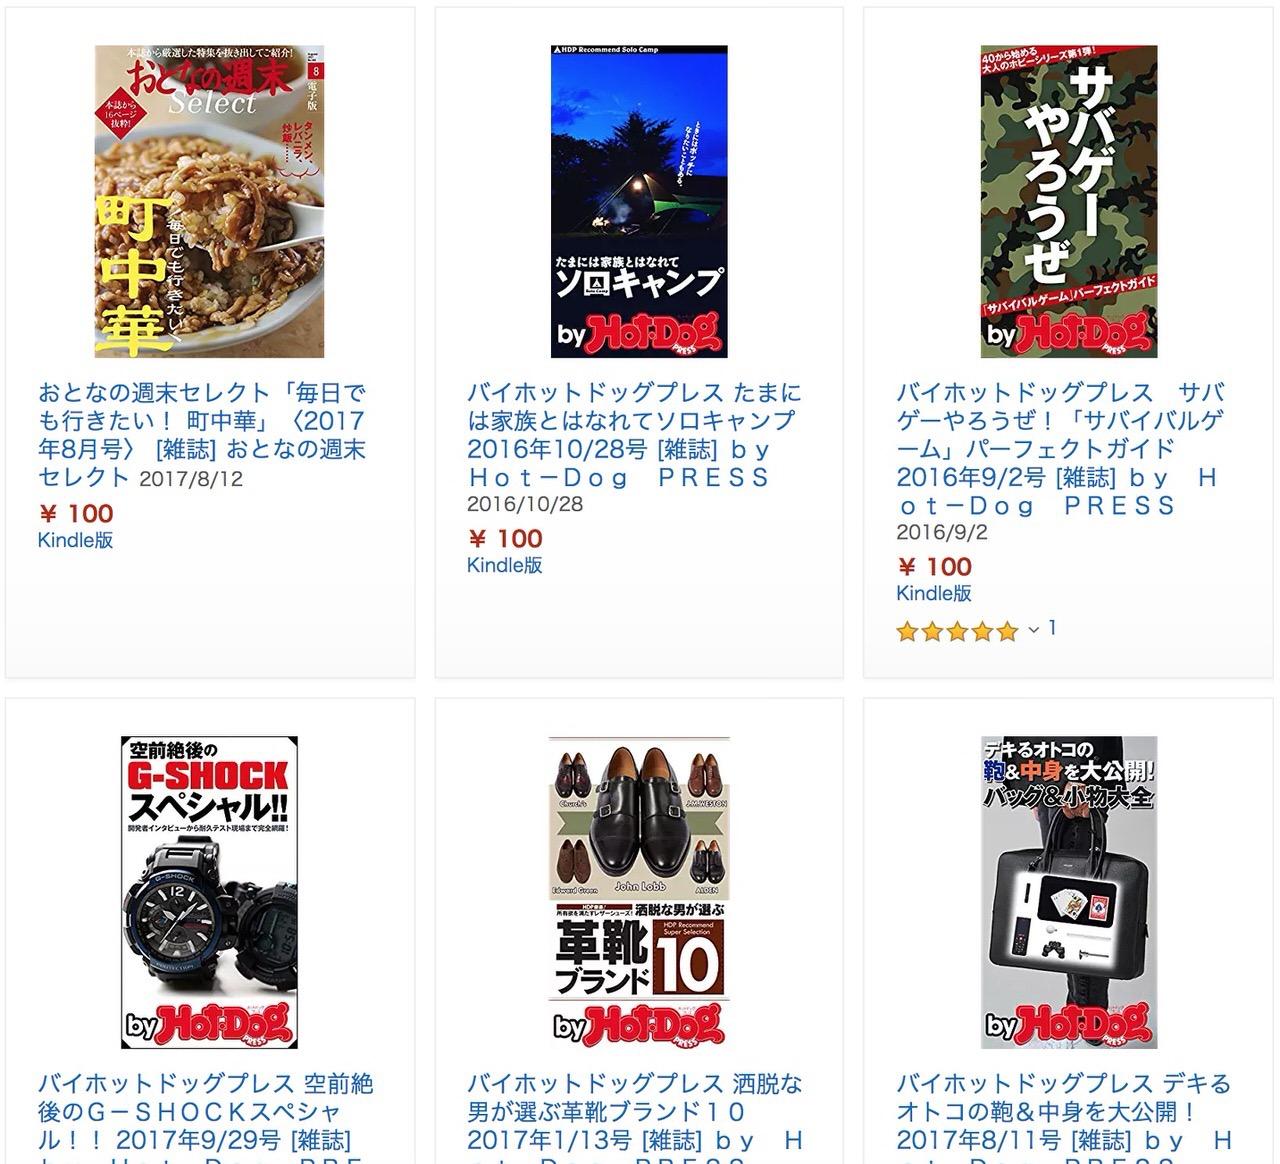 【Kindleセール】100円「Hot-Dog PRESS」&「おとなの週末」バックナンバーフェア【夏☆電書2018】